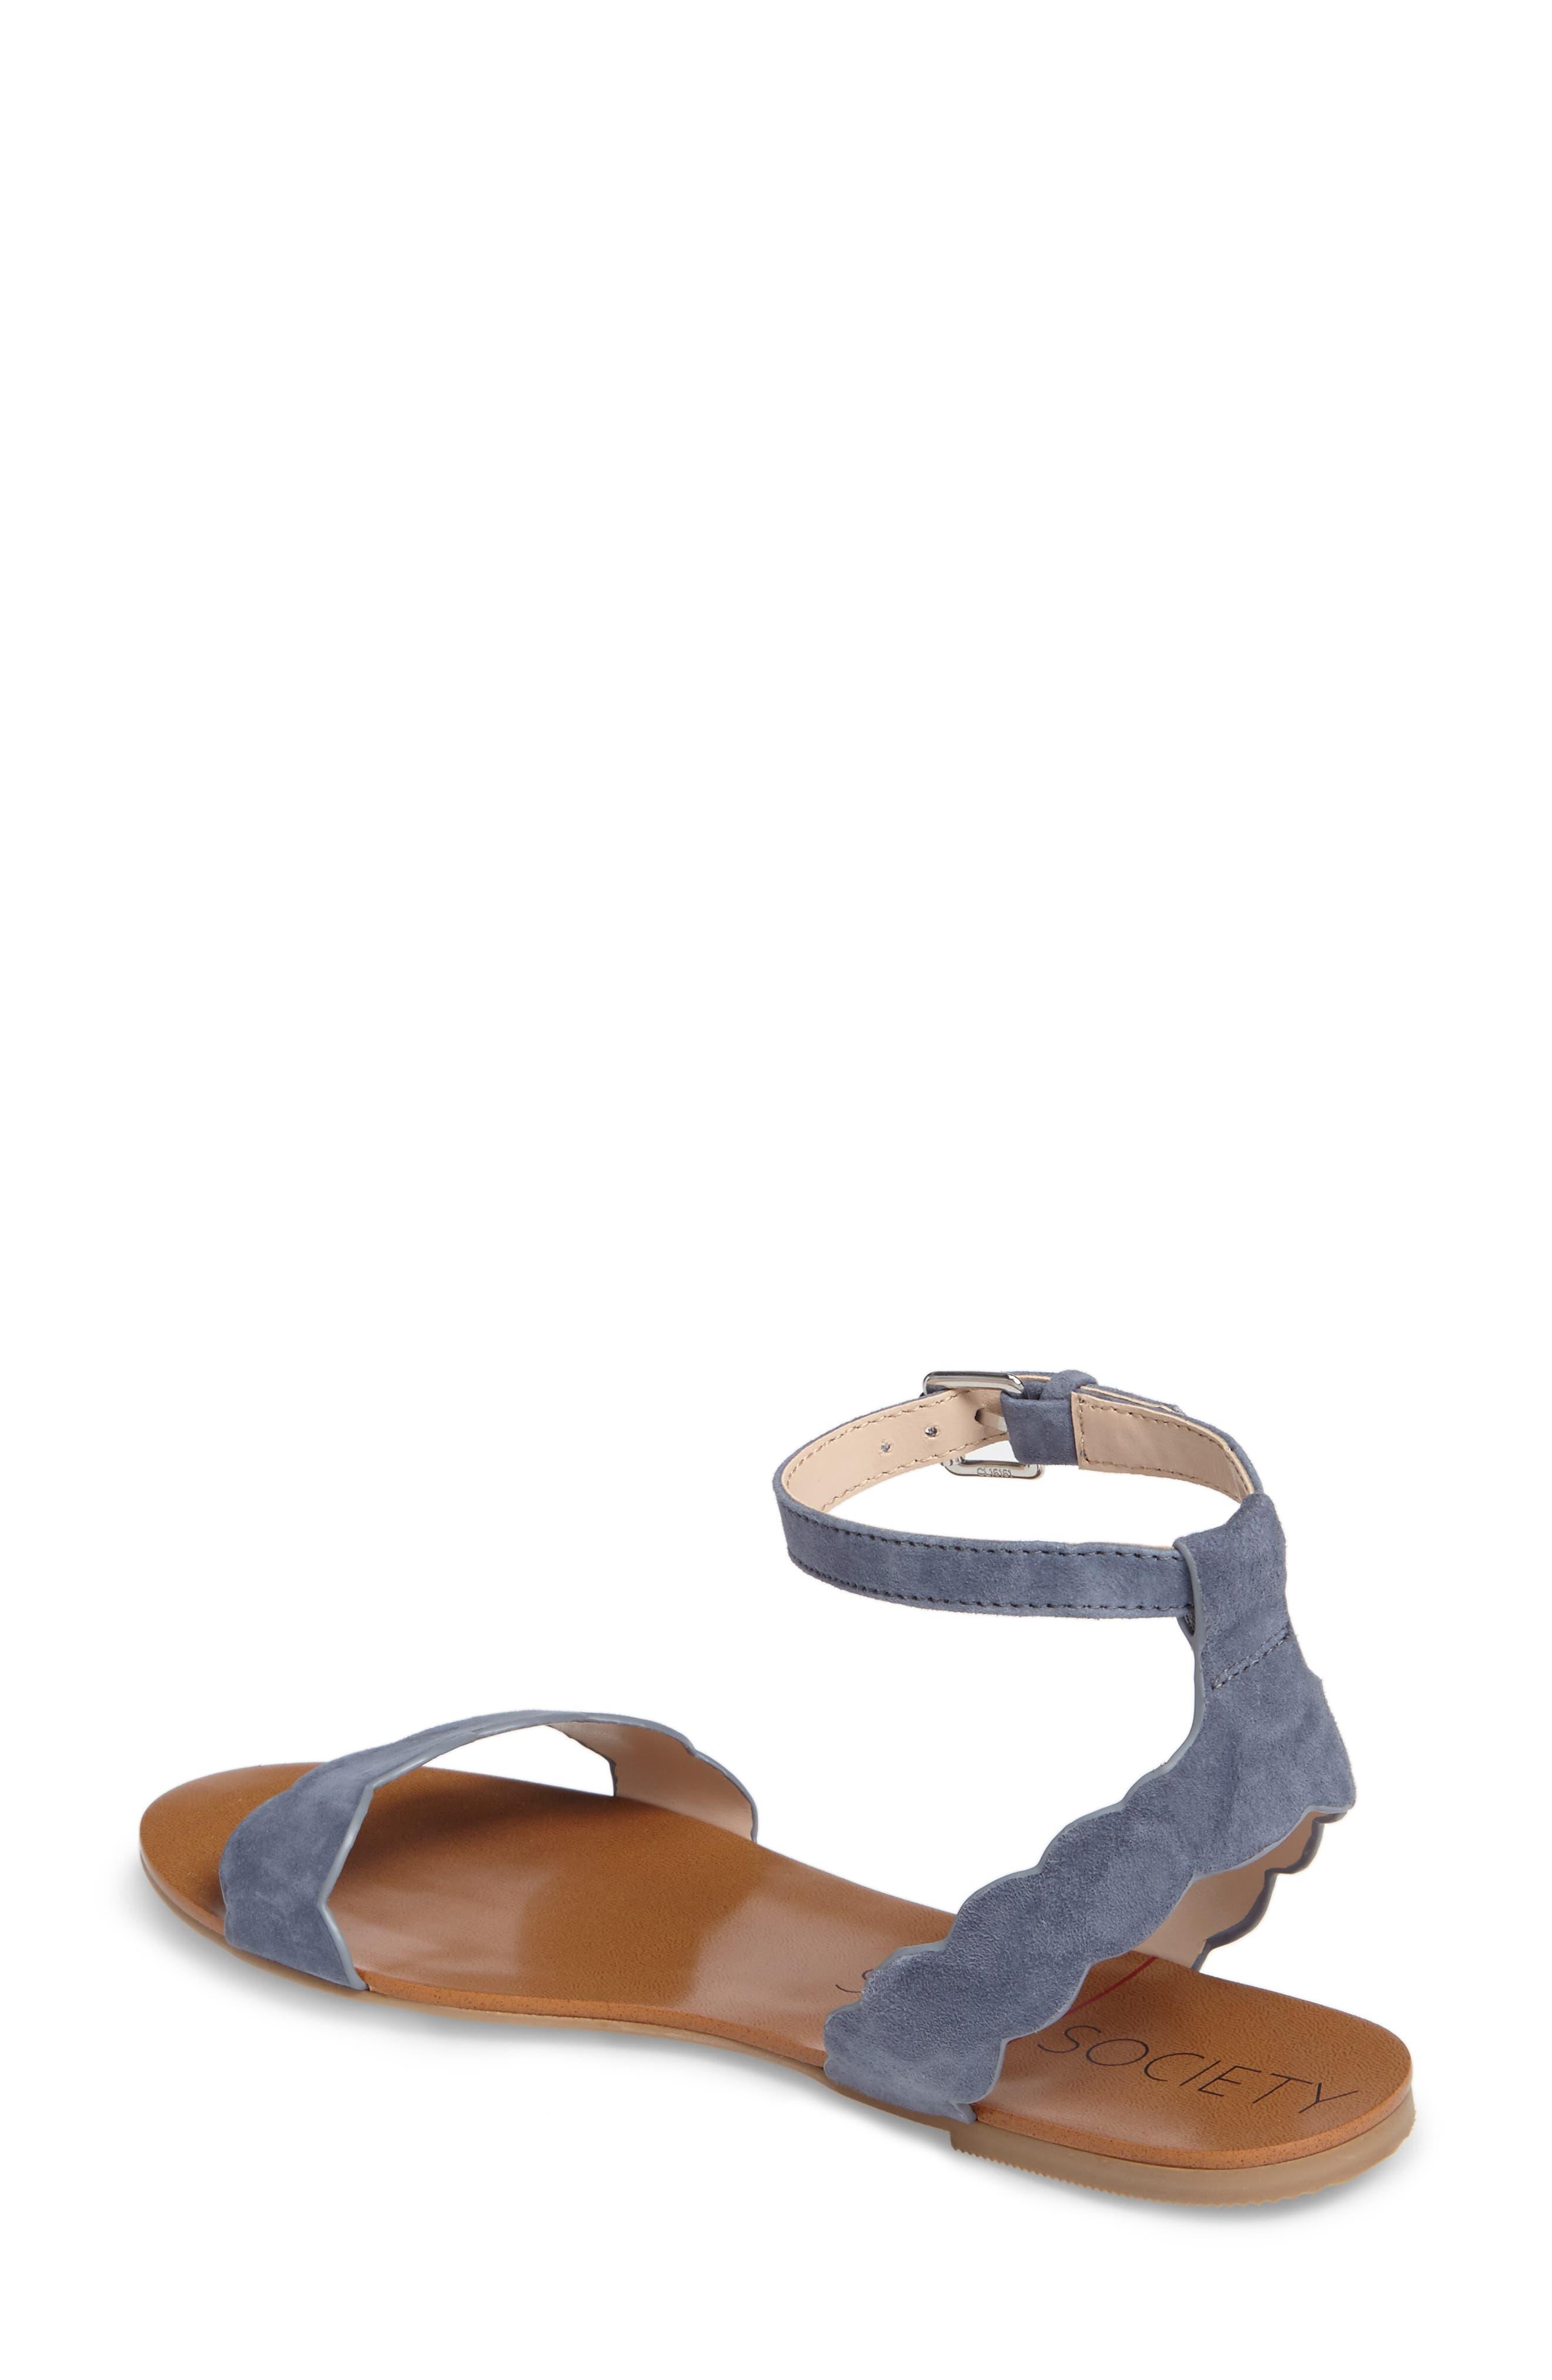 Alternate Image 2  - Sole Society 'Odette' Scalloped Ankle Strap Flat Sandal (Women)